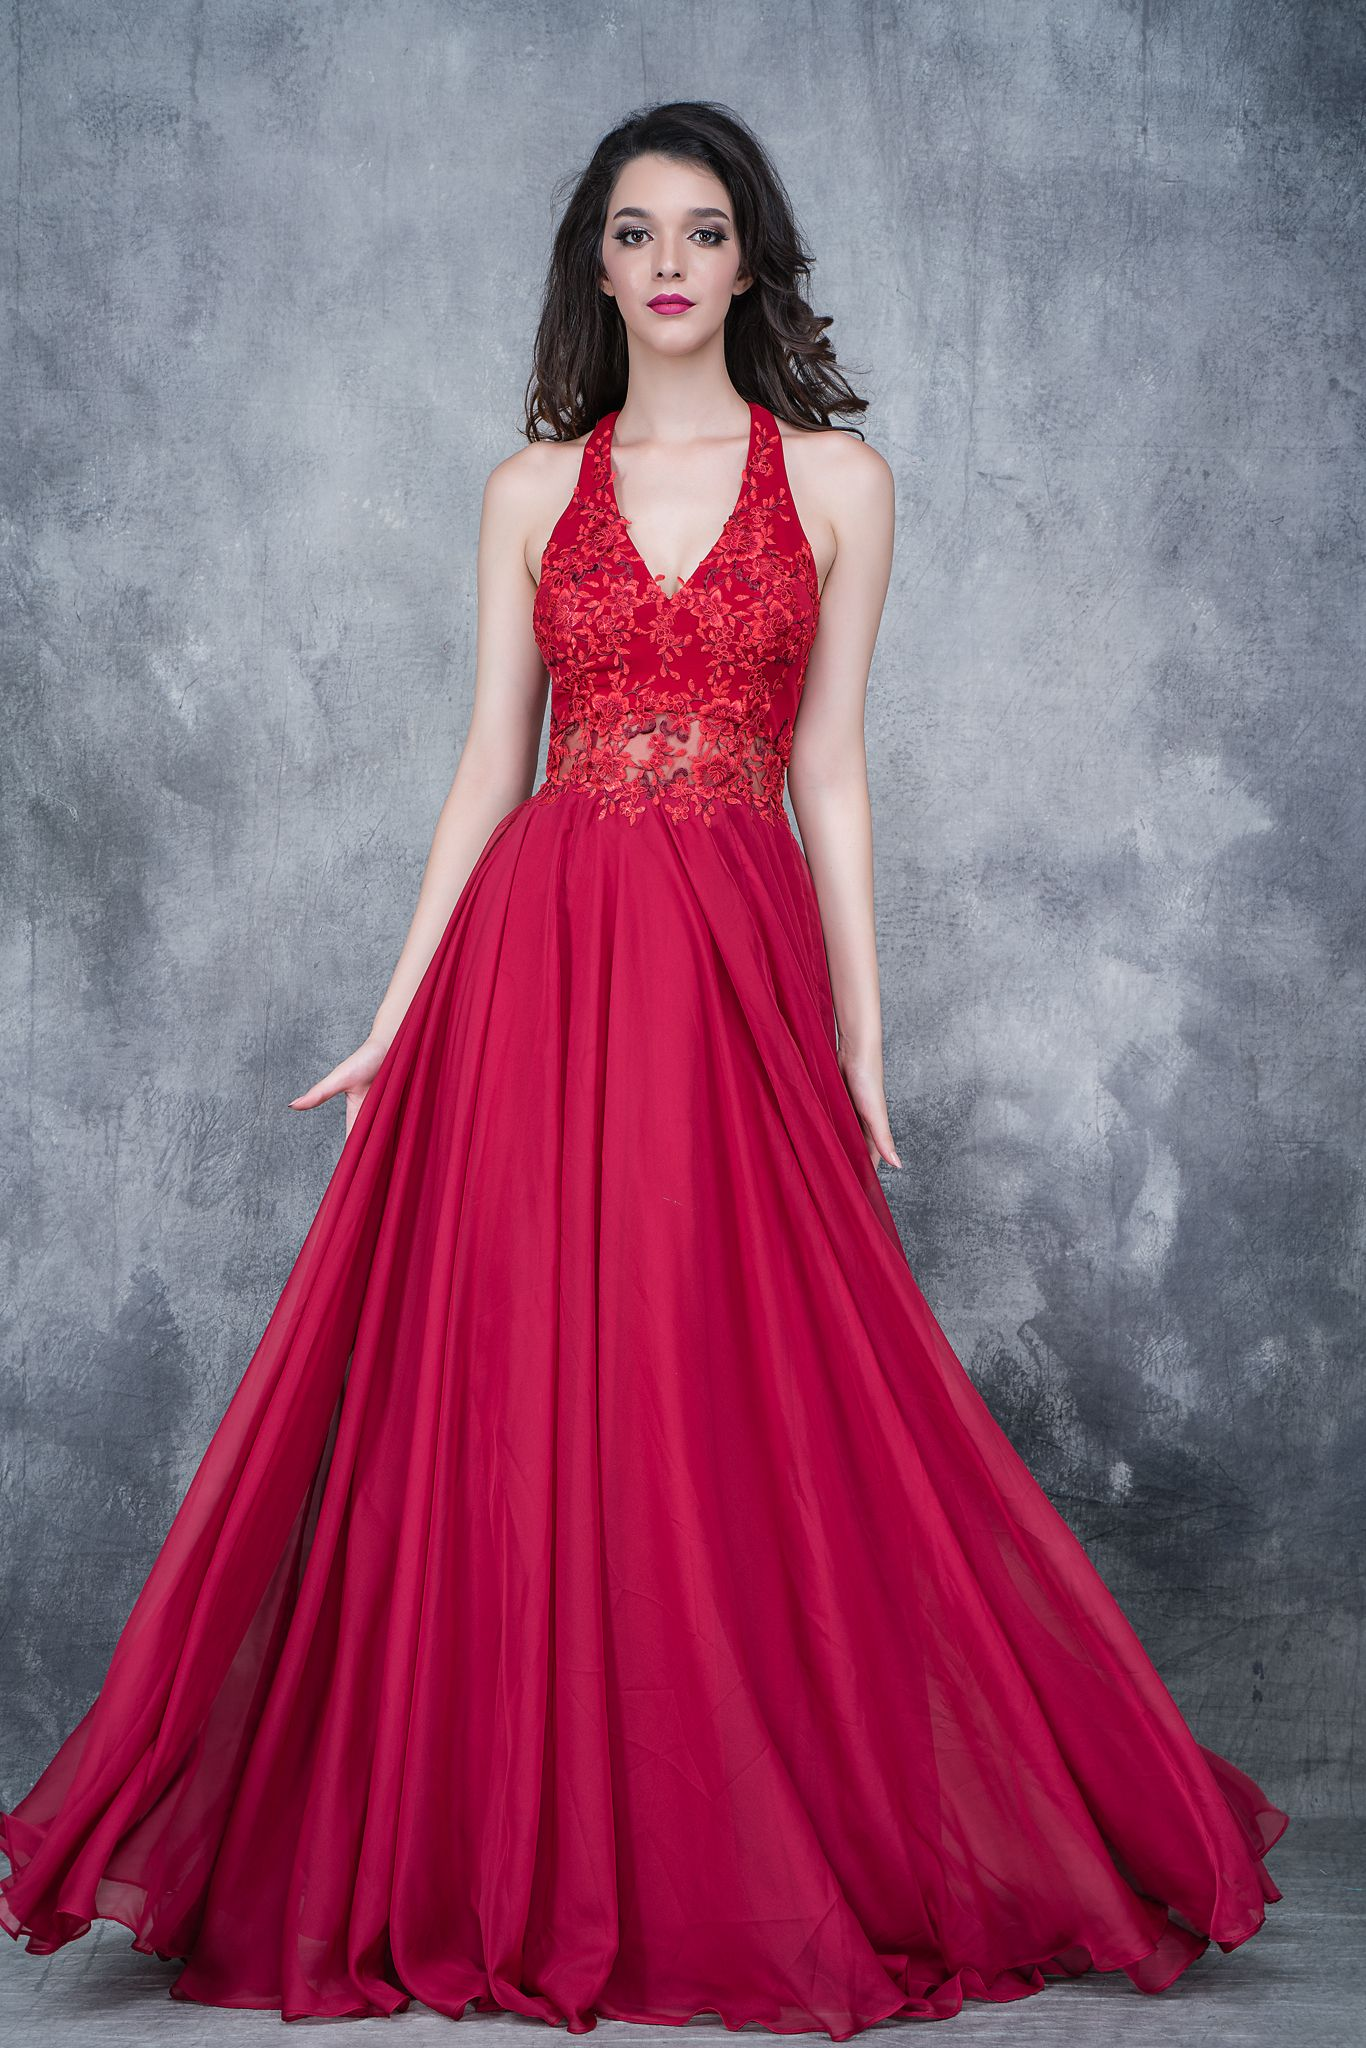 2160 Burgundy Size 18 Prom Dresses Piece Prom Dress Prom Dresses Long